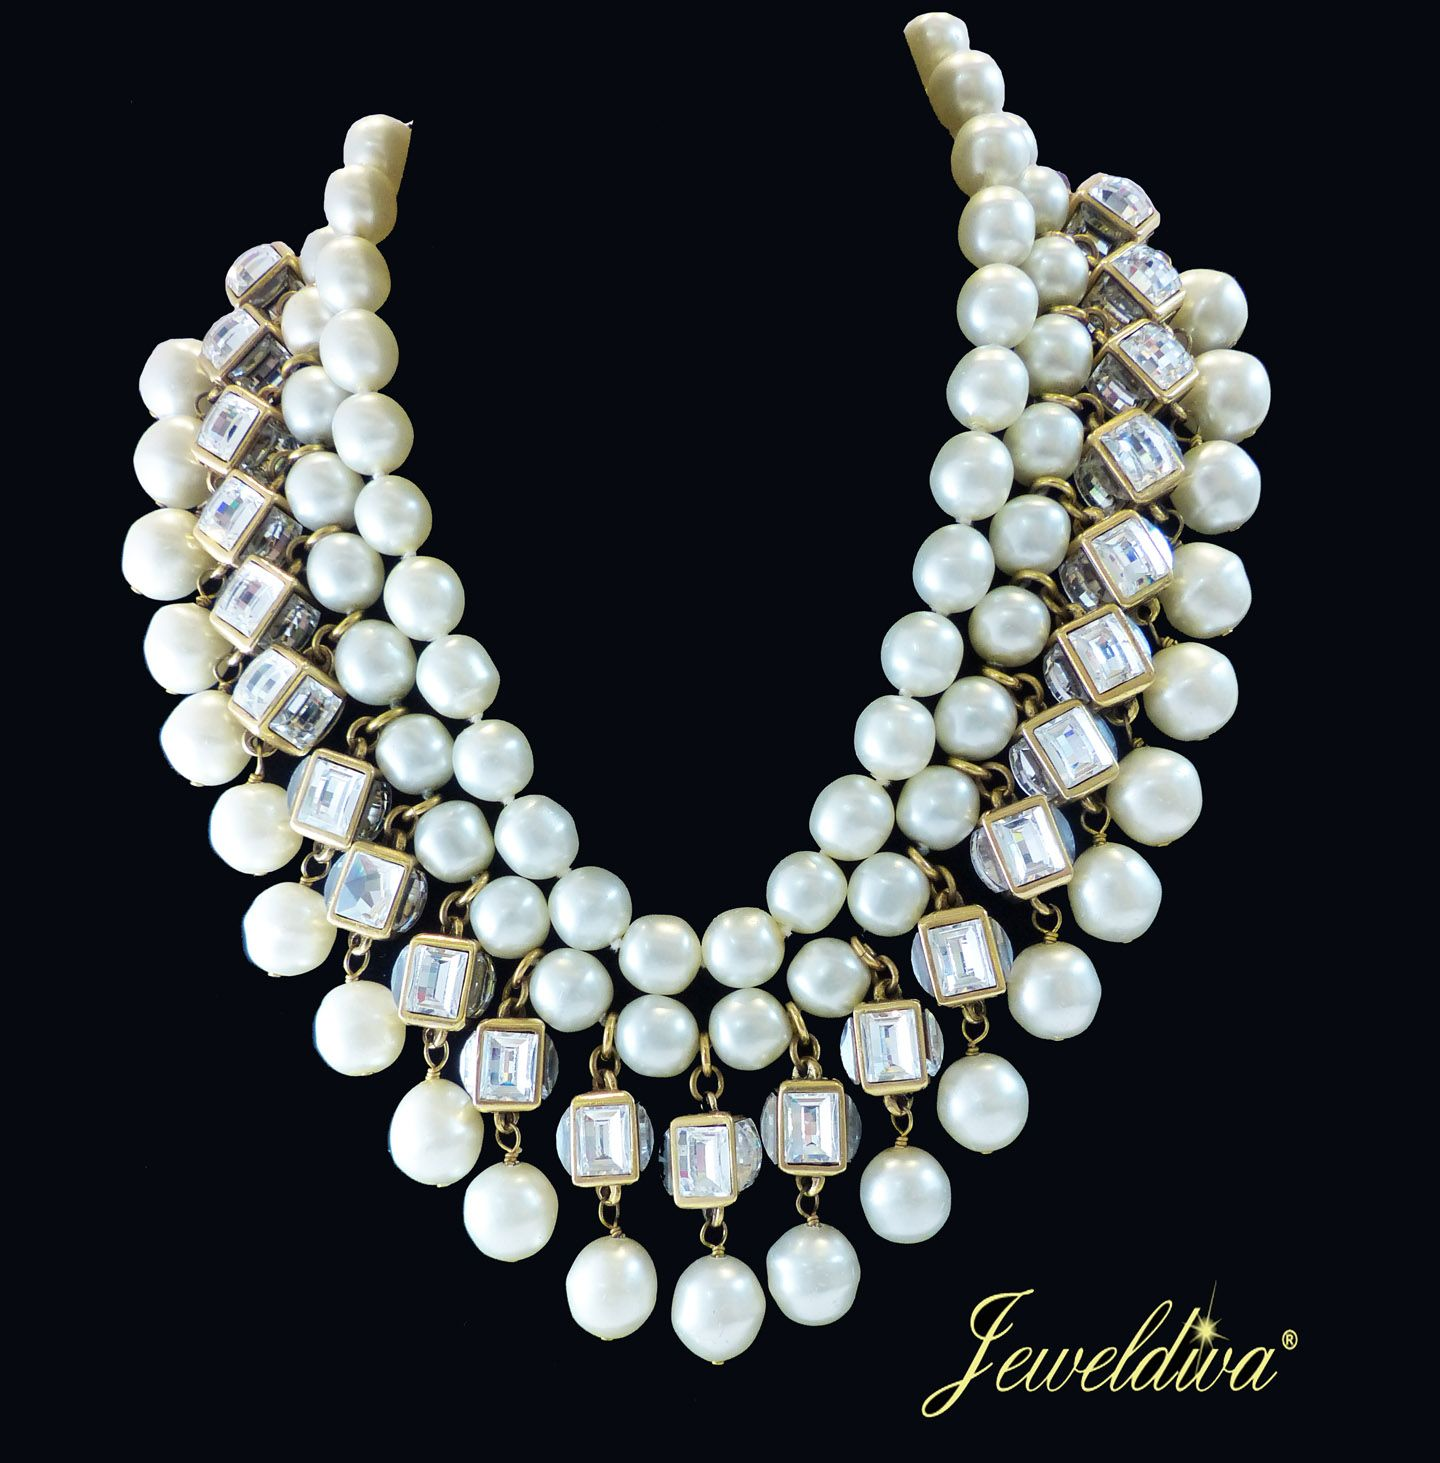 ec957e79e486 Vintage Signed Chanel 23 Multi-Strand Faux Pearl Necklace http   www ...